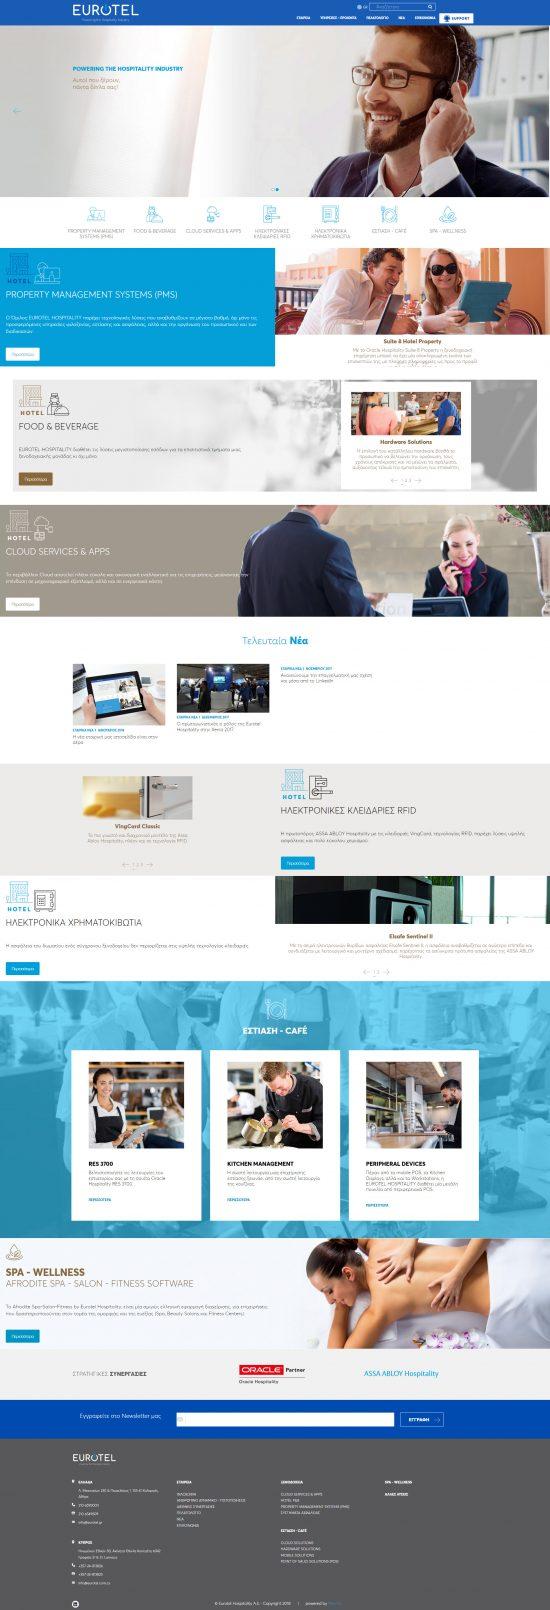 eurotel-Website-1